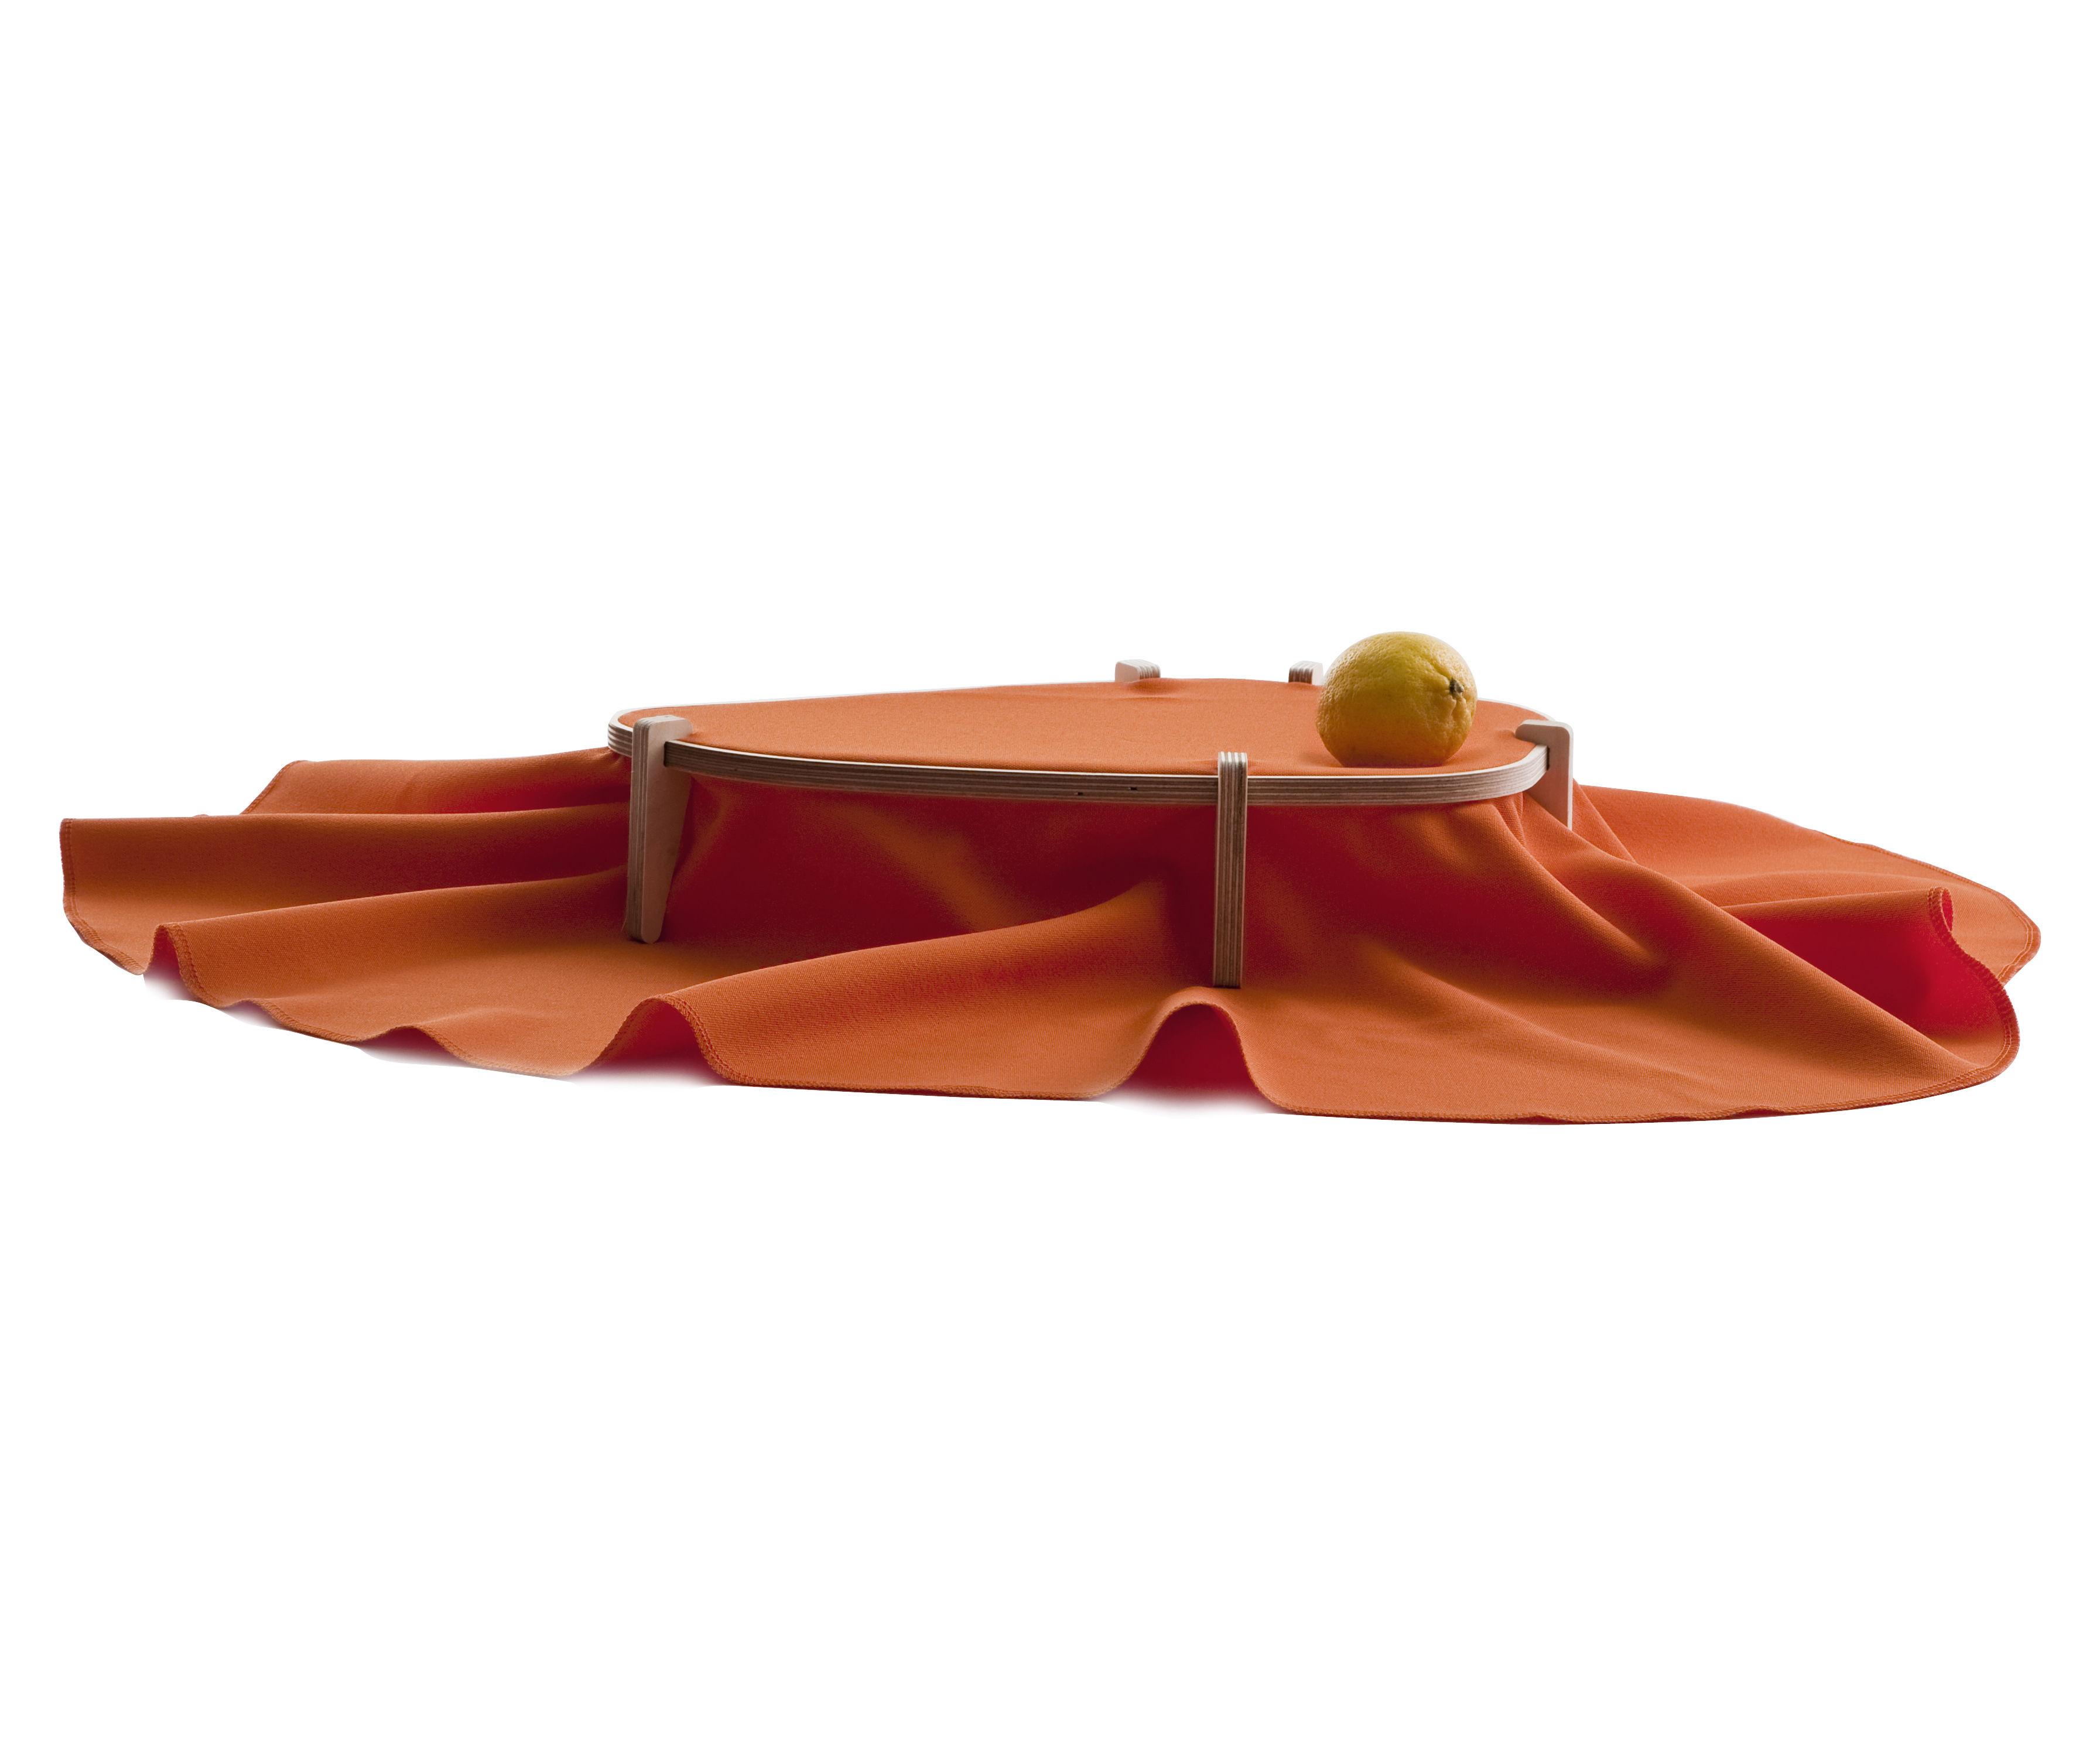 Tableware - Fruit Bowls & Centrepieces - Dress Centrepiece - 65 x 35 cm by Moustache - Orange - Birch plywood, Polyester fabric